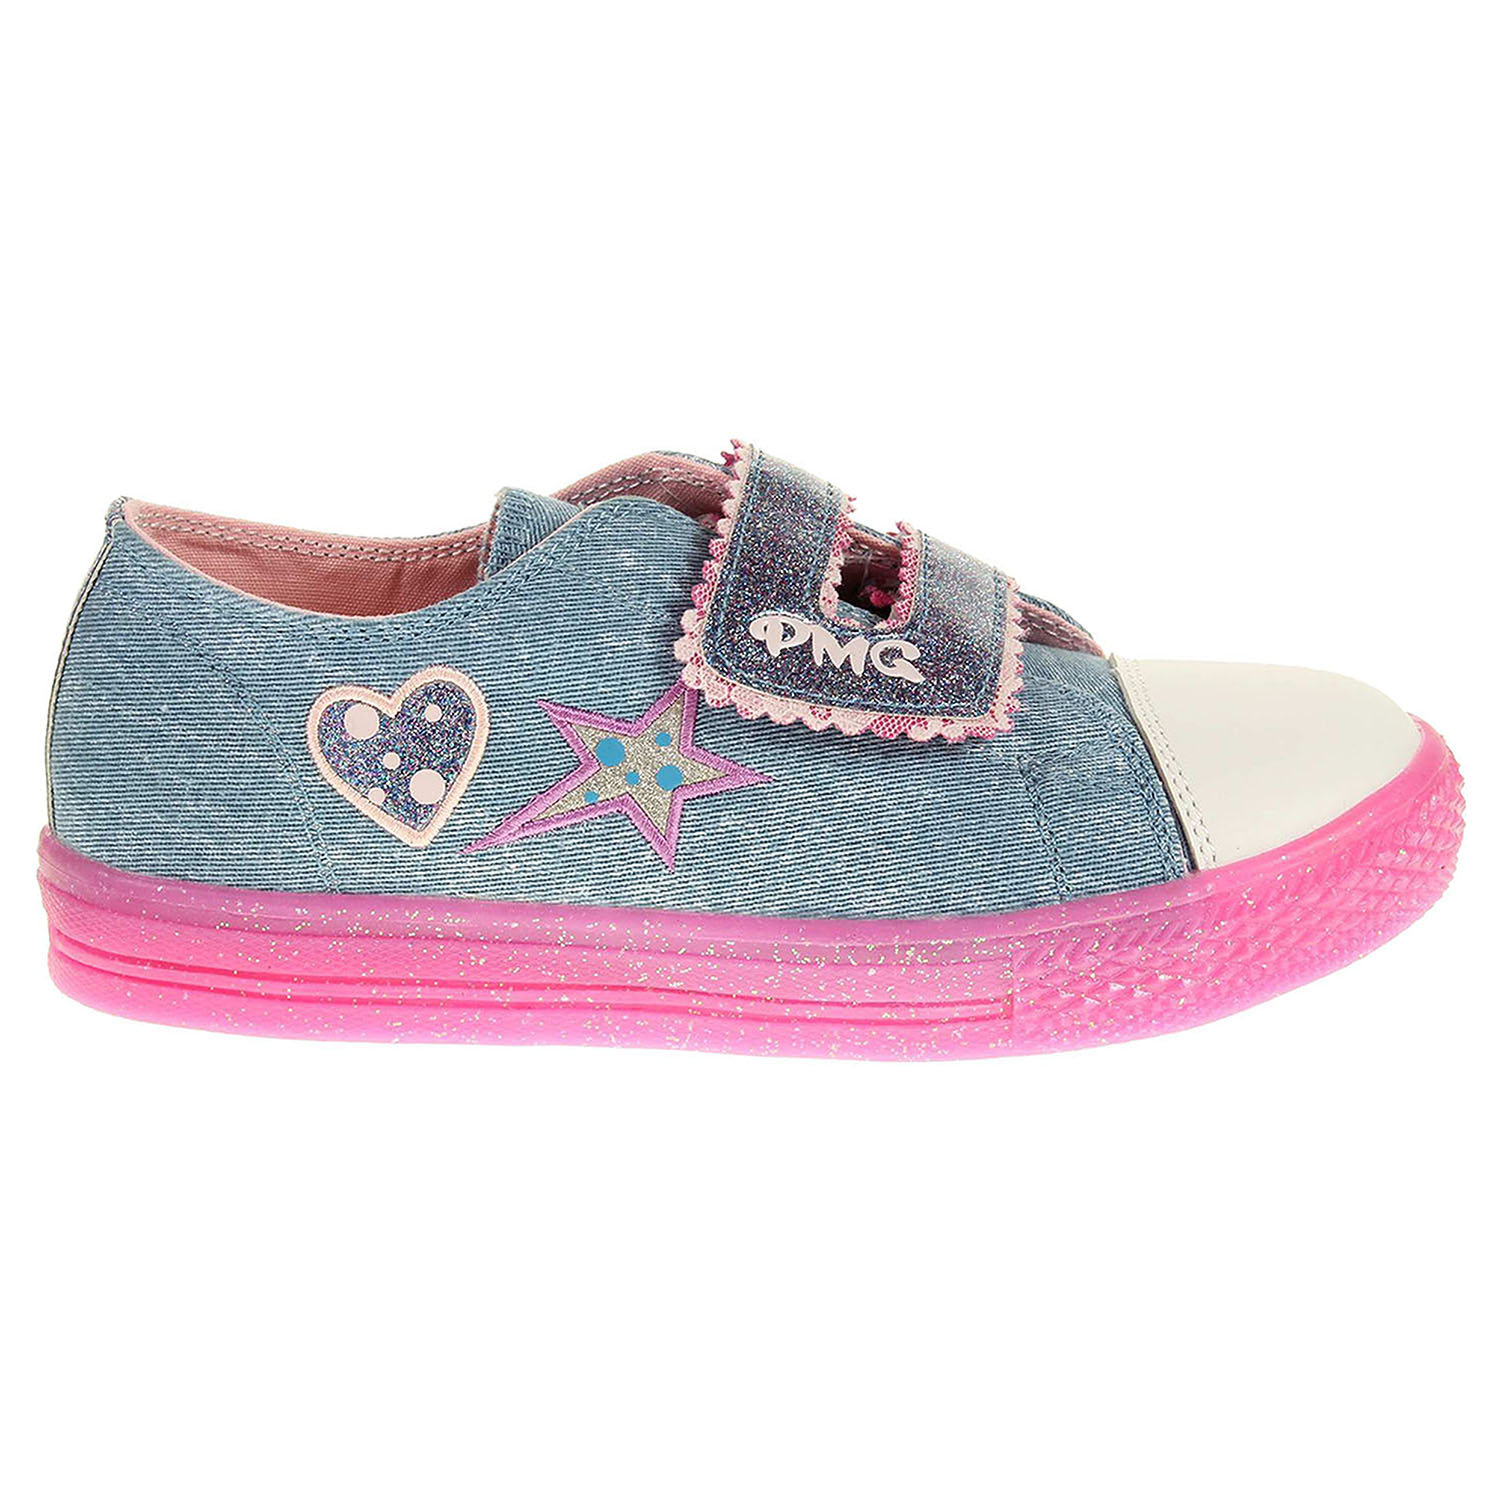 Ecco Primigi dívčí obuv 7329000 modrá 26600116